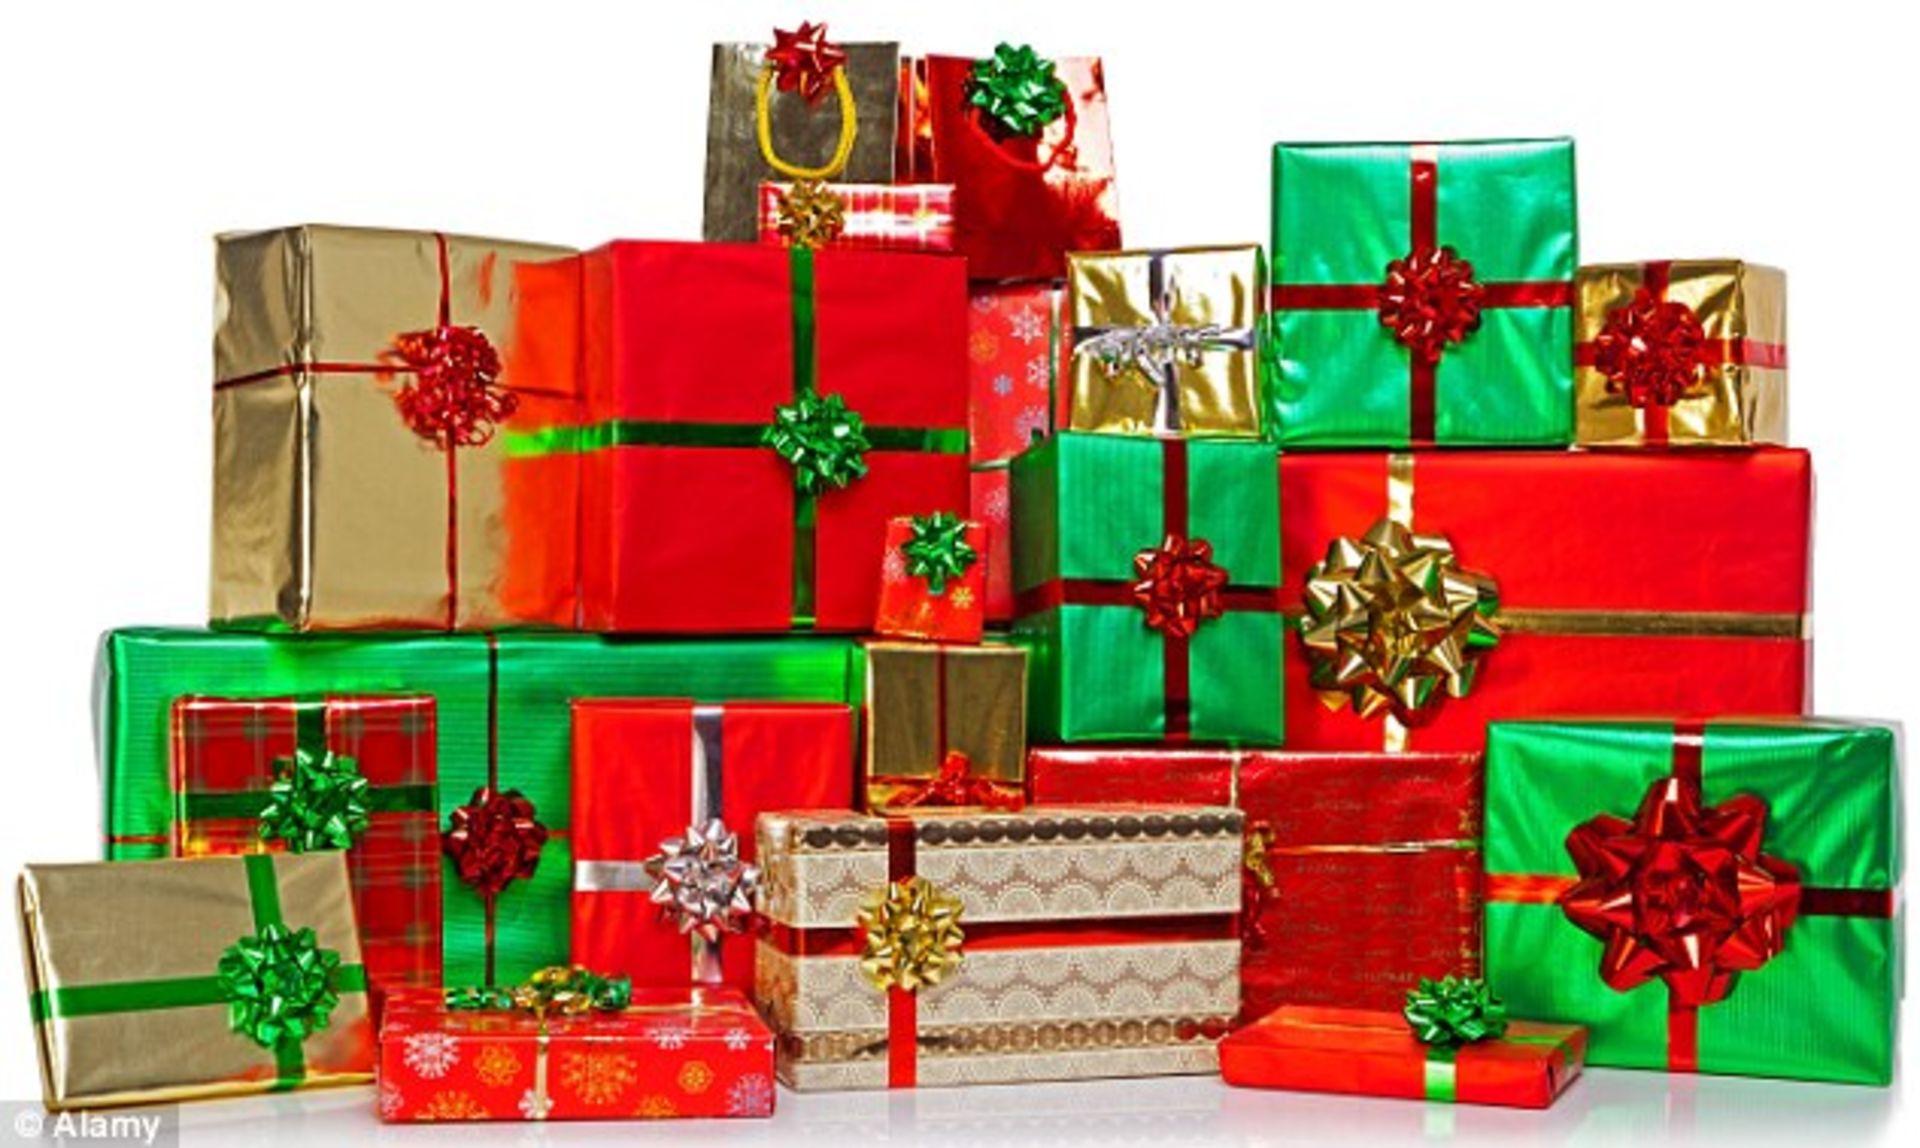 7 Simple Strategies To Avoid Overspending This Holiday Season